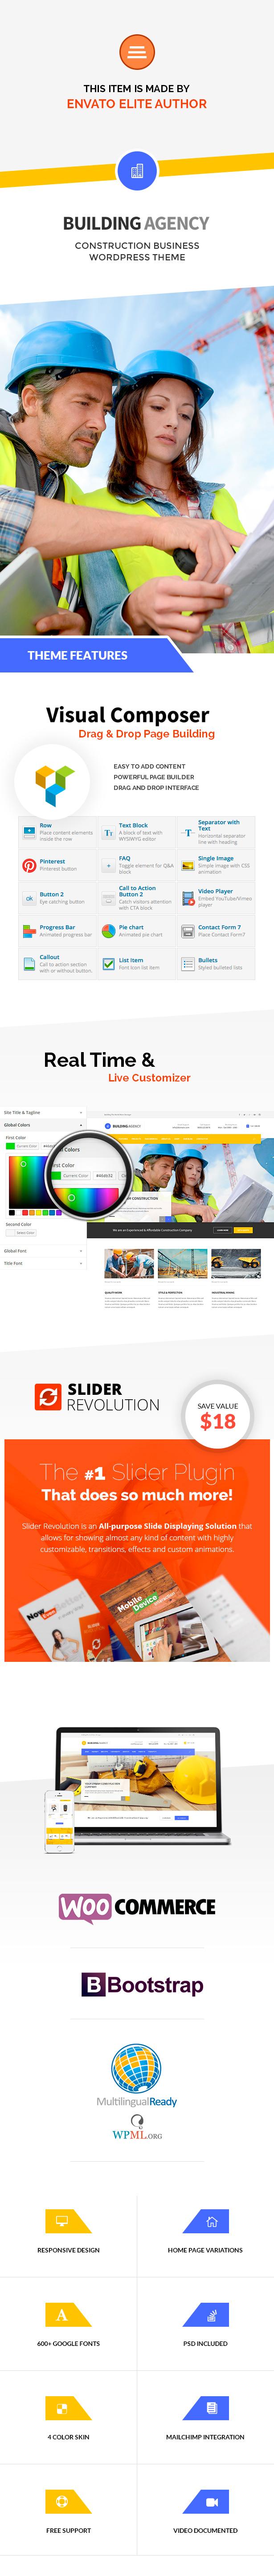 Building Agency - Construction WordPress Theme - 1